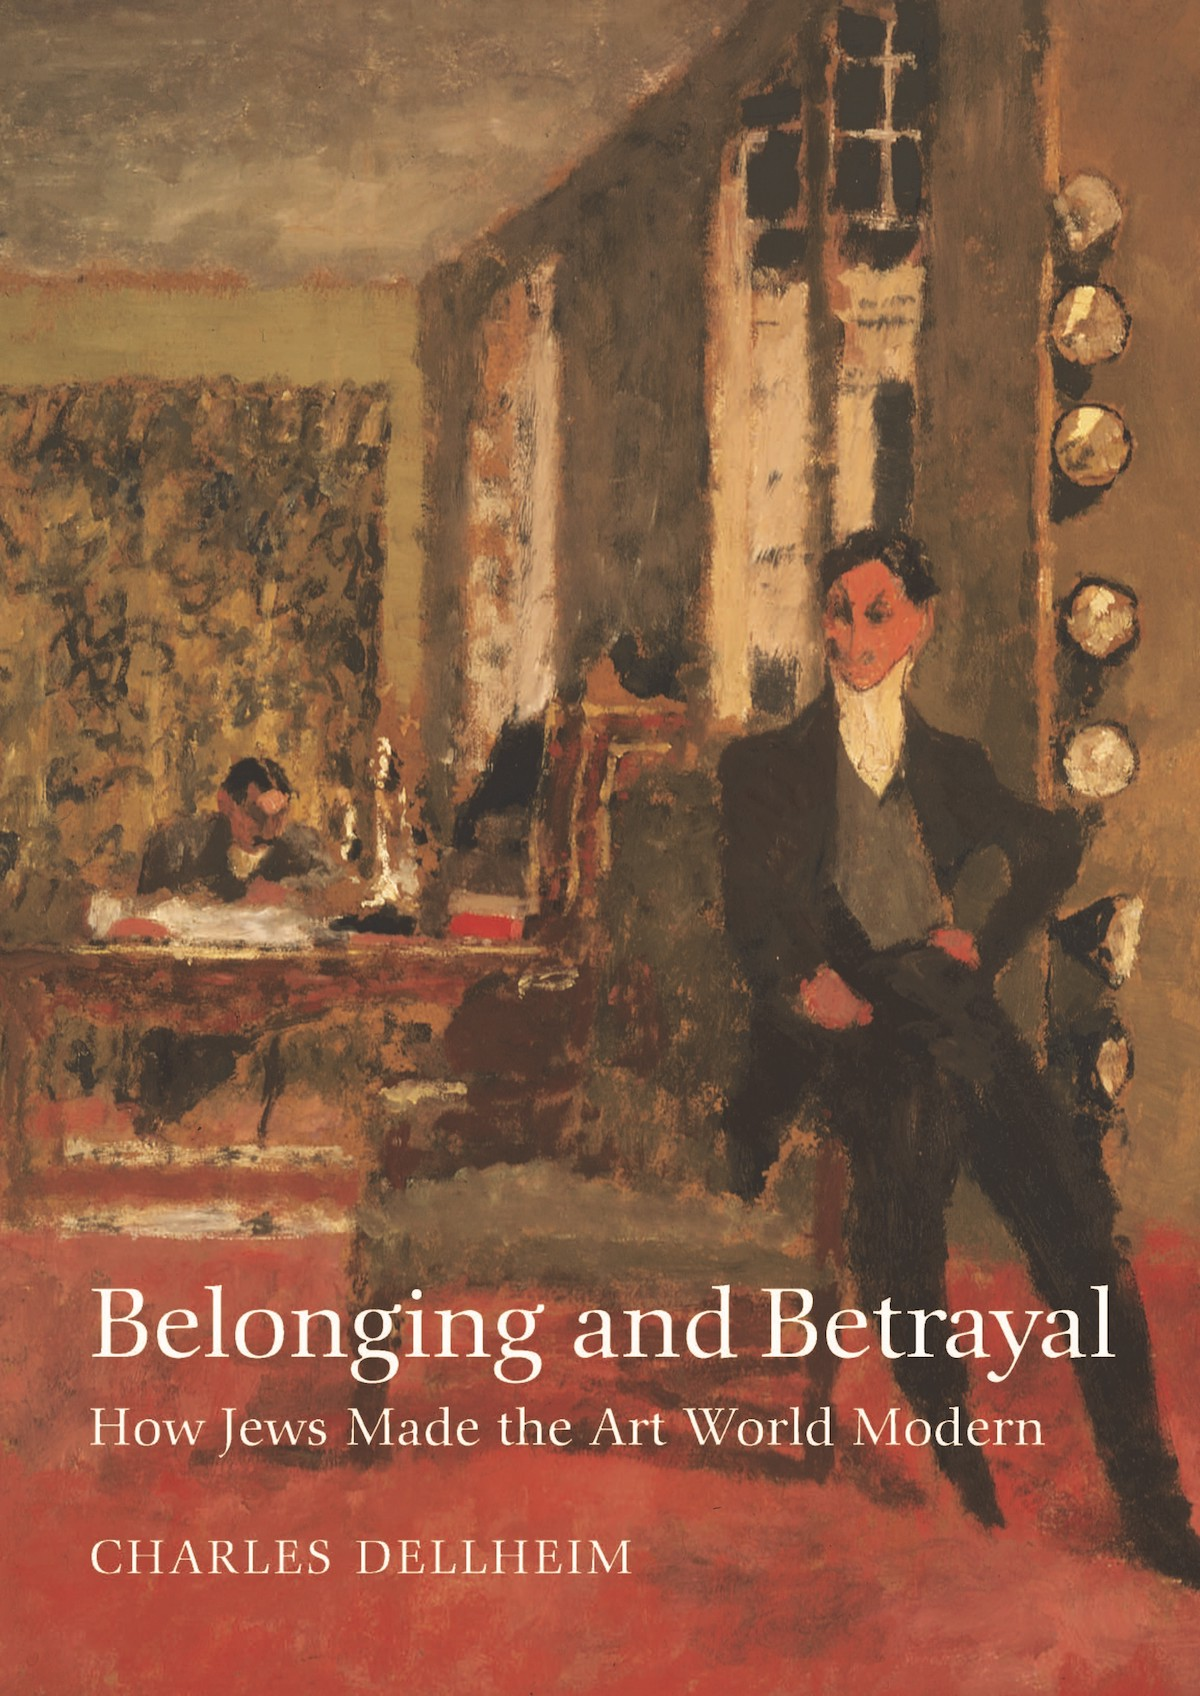 Belonging and Betrayal cover